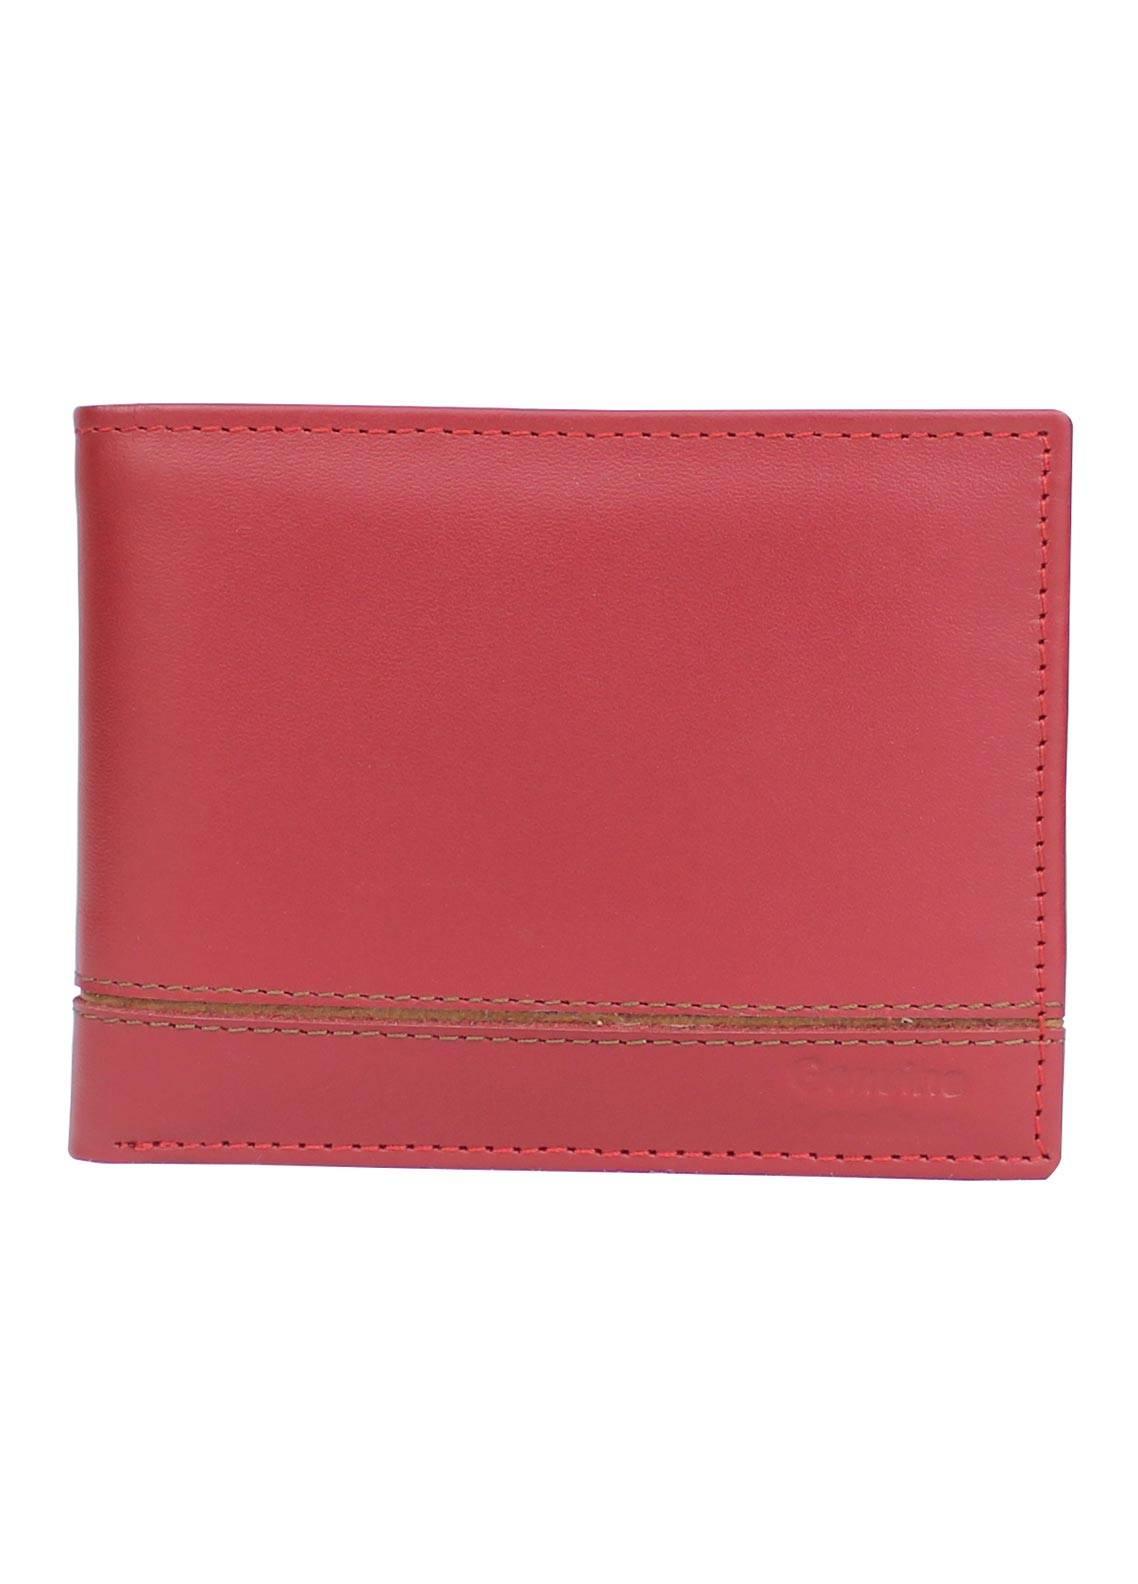 Shahzeb Saeed Plain Texture Leather  Wallet W-066 - Men's Accessories